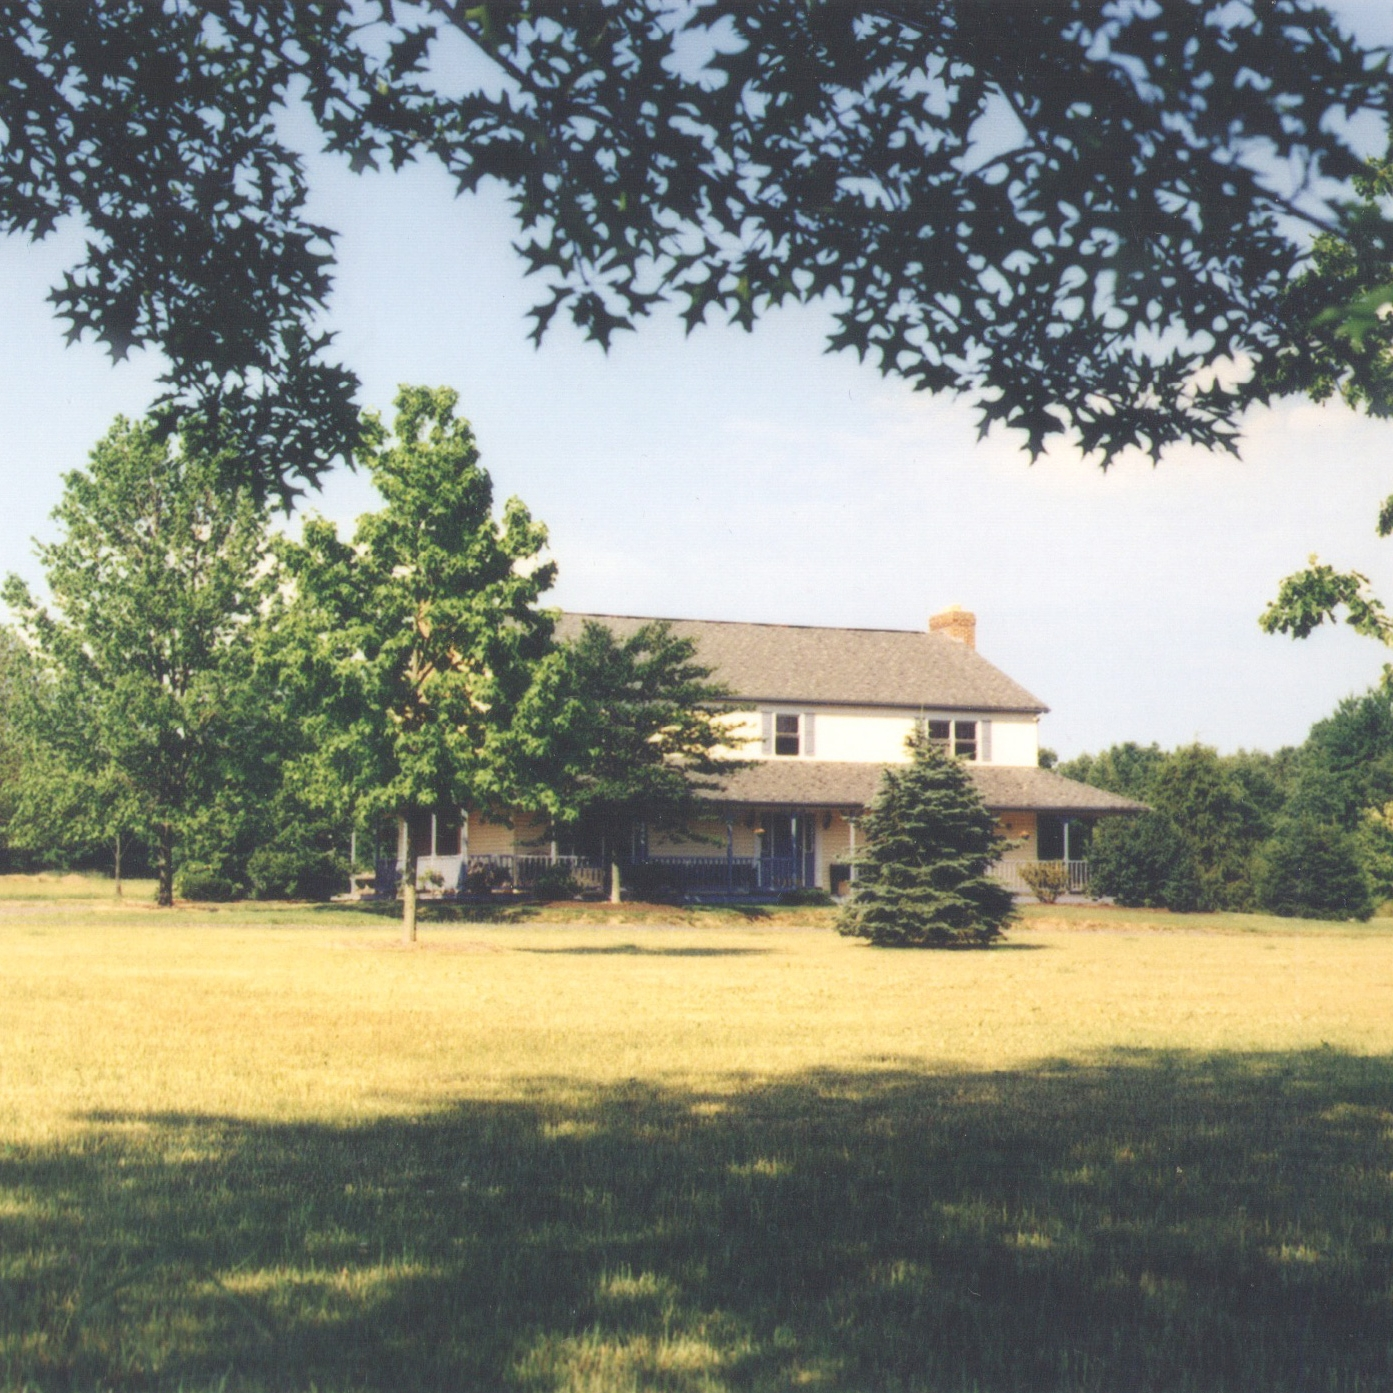 amtree-house-1-after-b.jpg